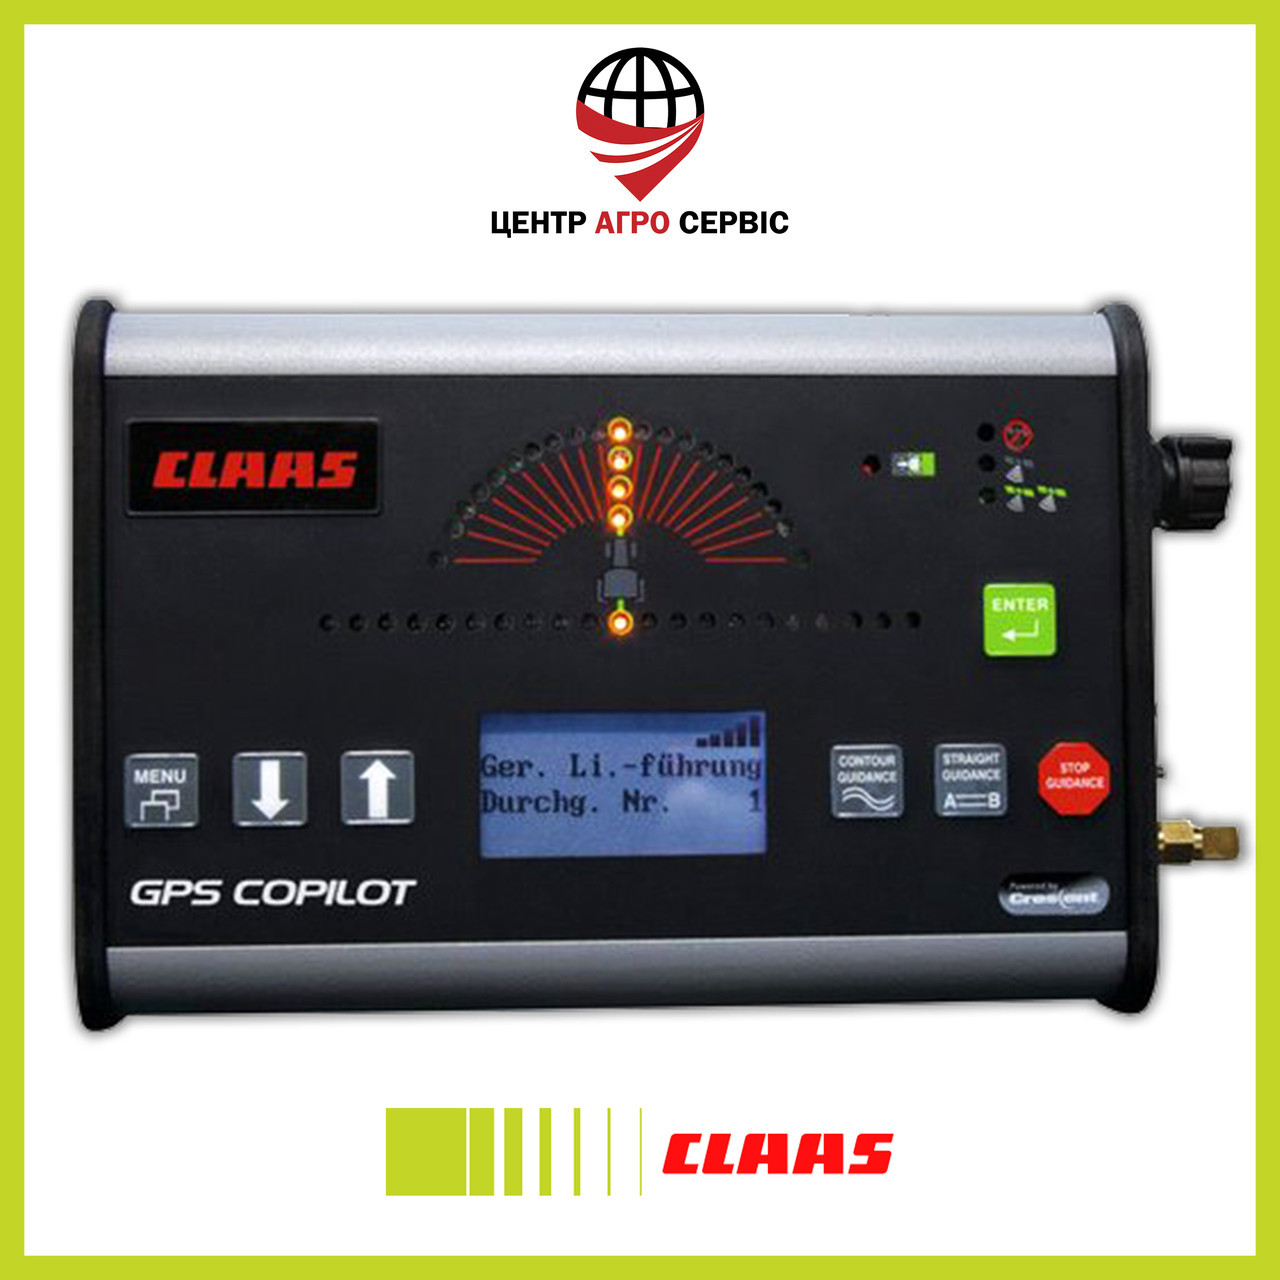 Gps навигатор для трактора (навигатор для поля, сельхоз навигатор)  CLAAS Copilot S-lite